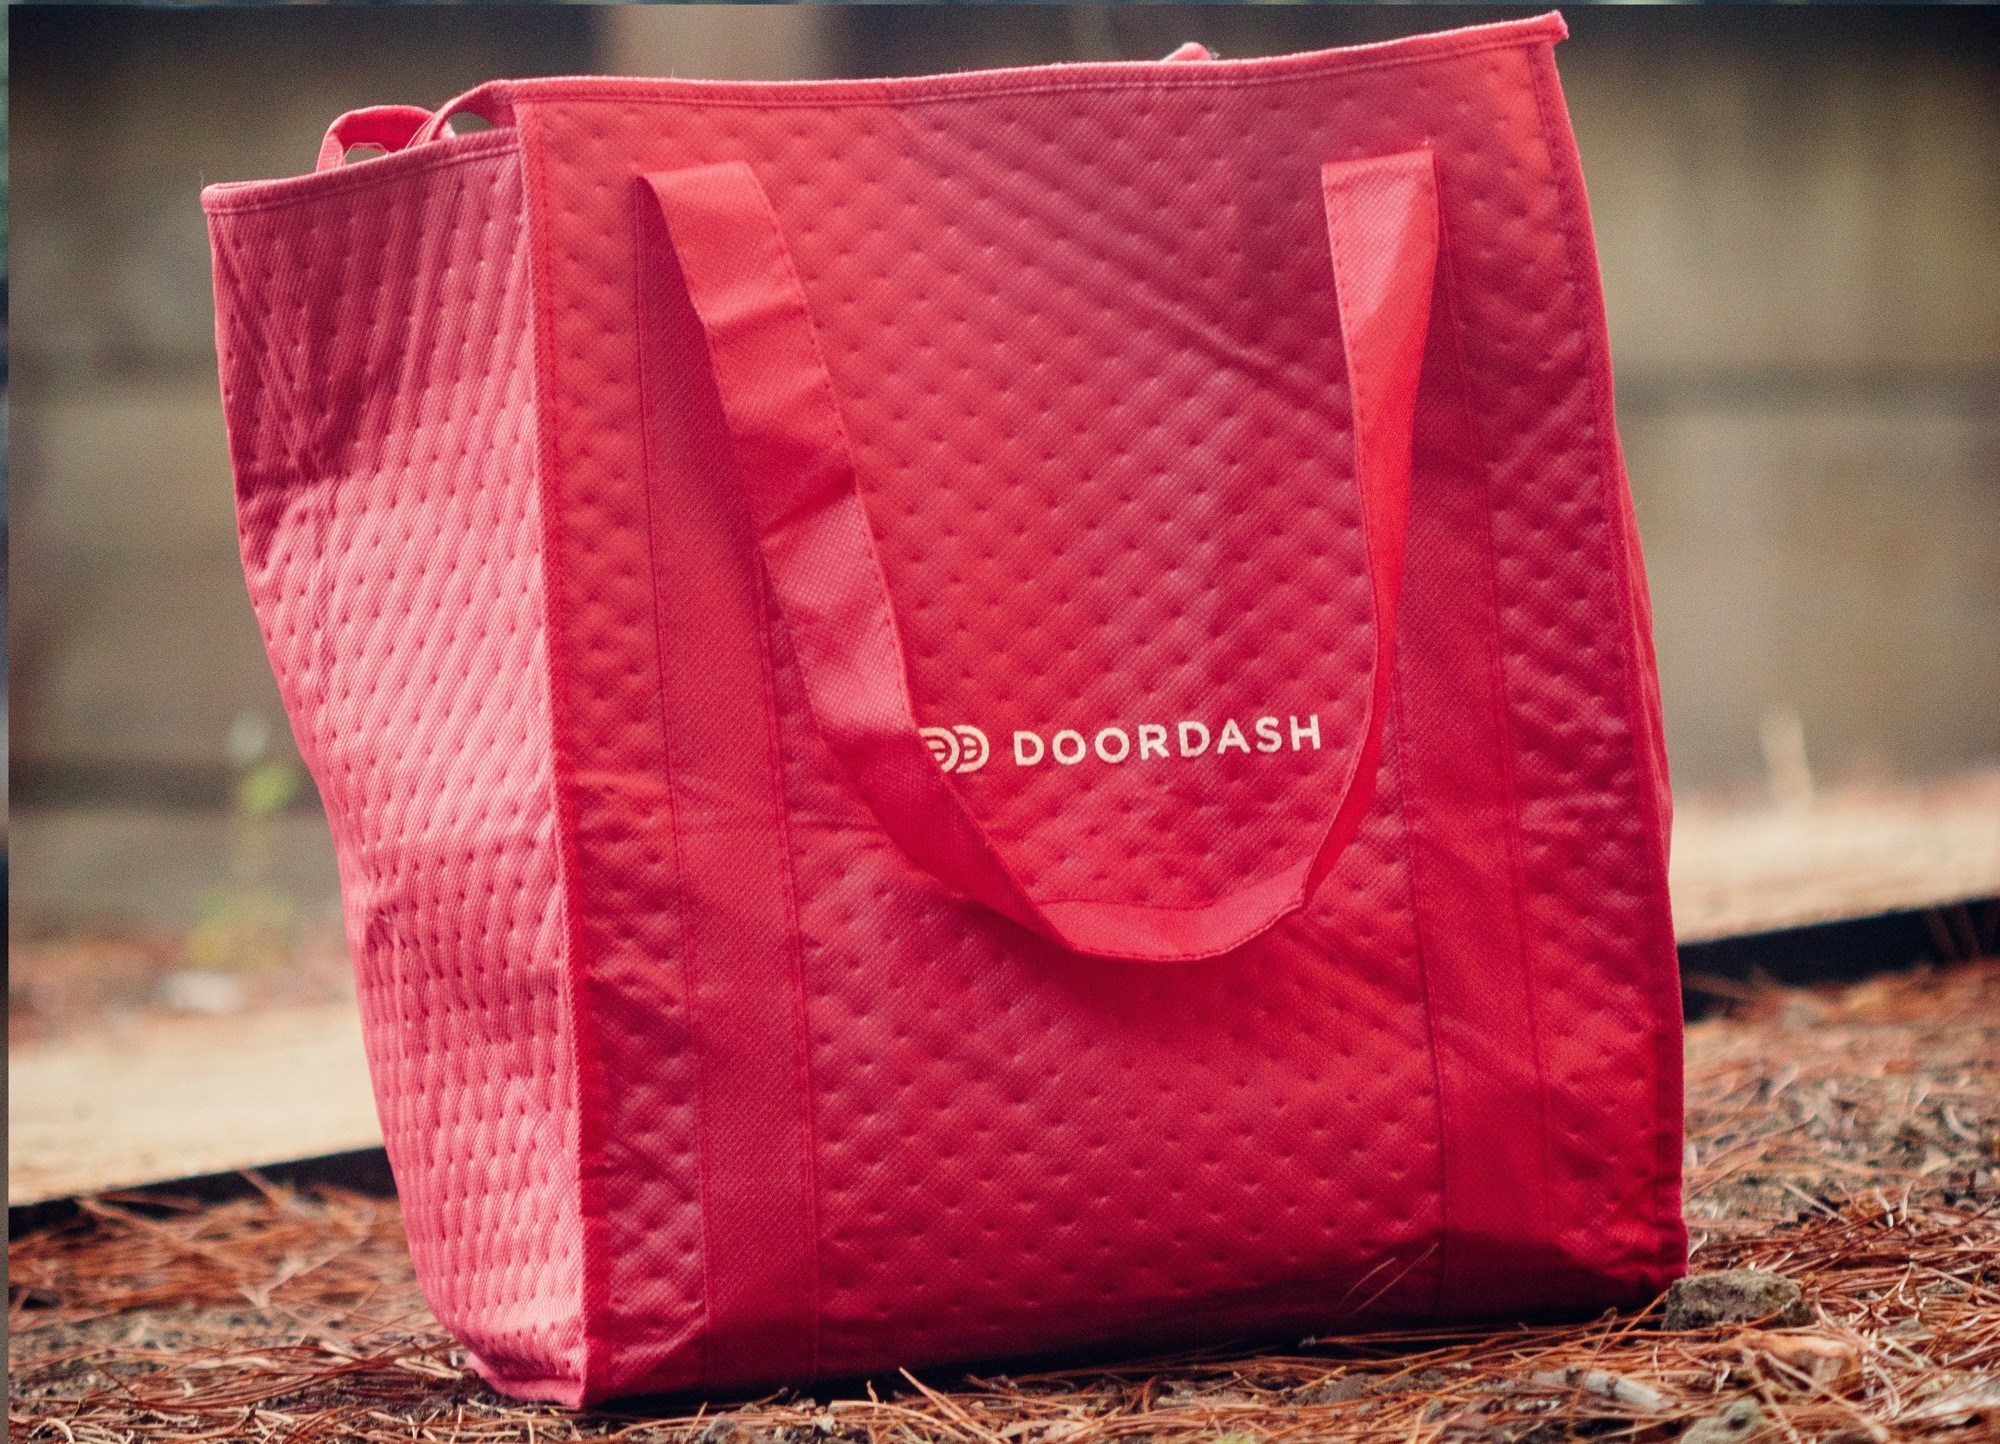 DoorDash stock, DASH stock, DASH stock news